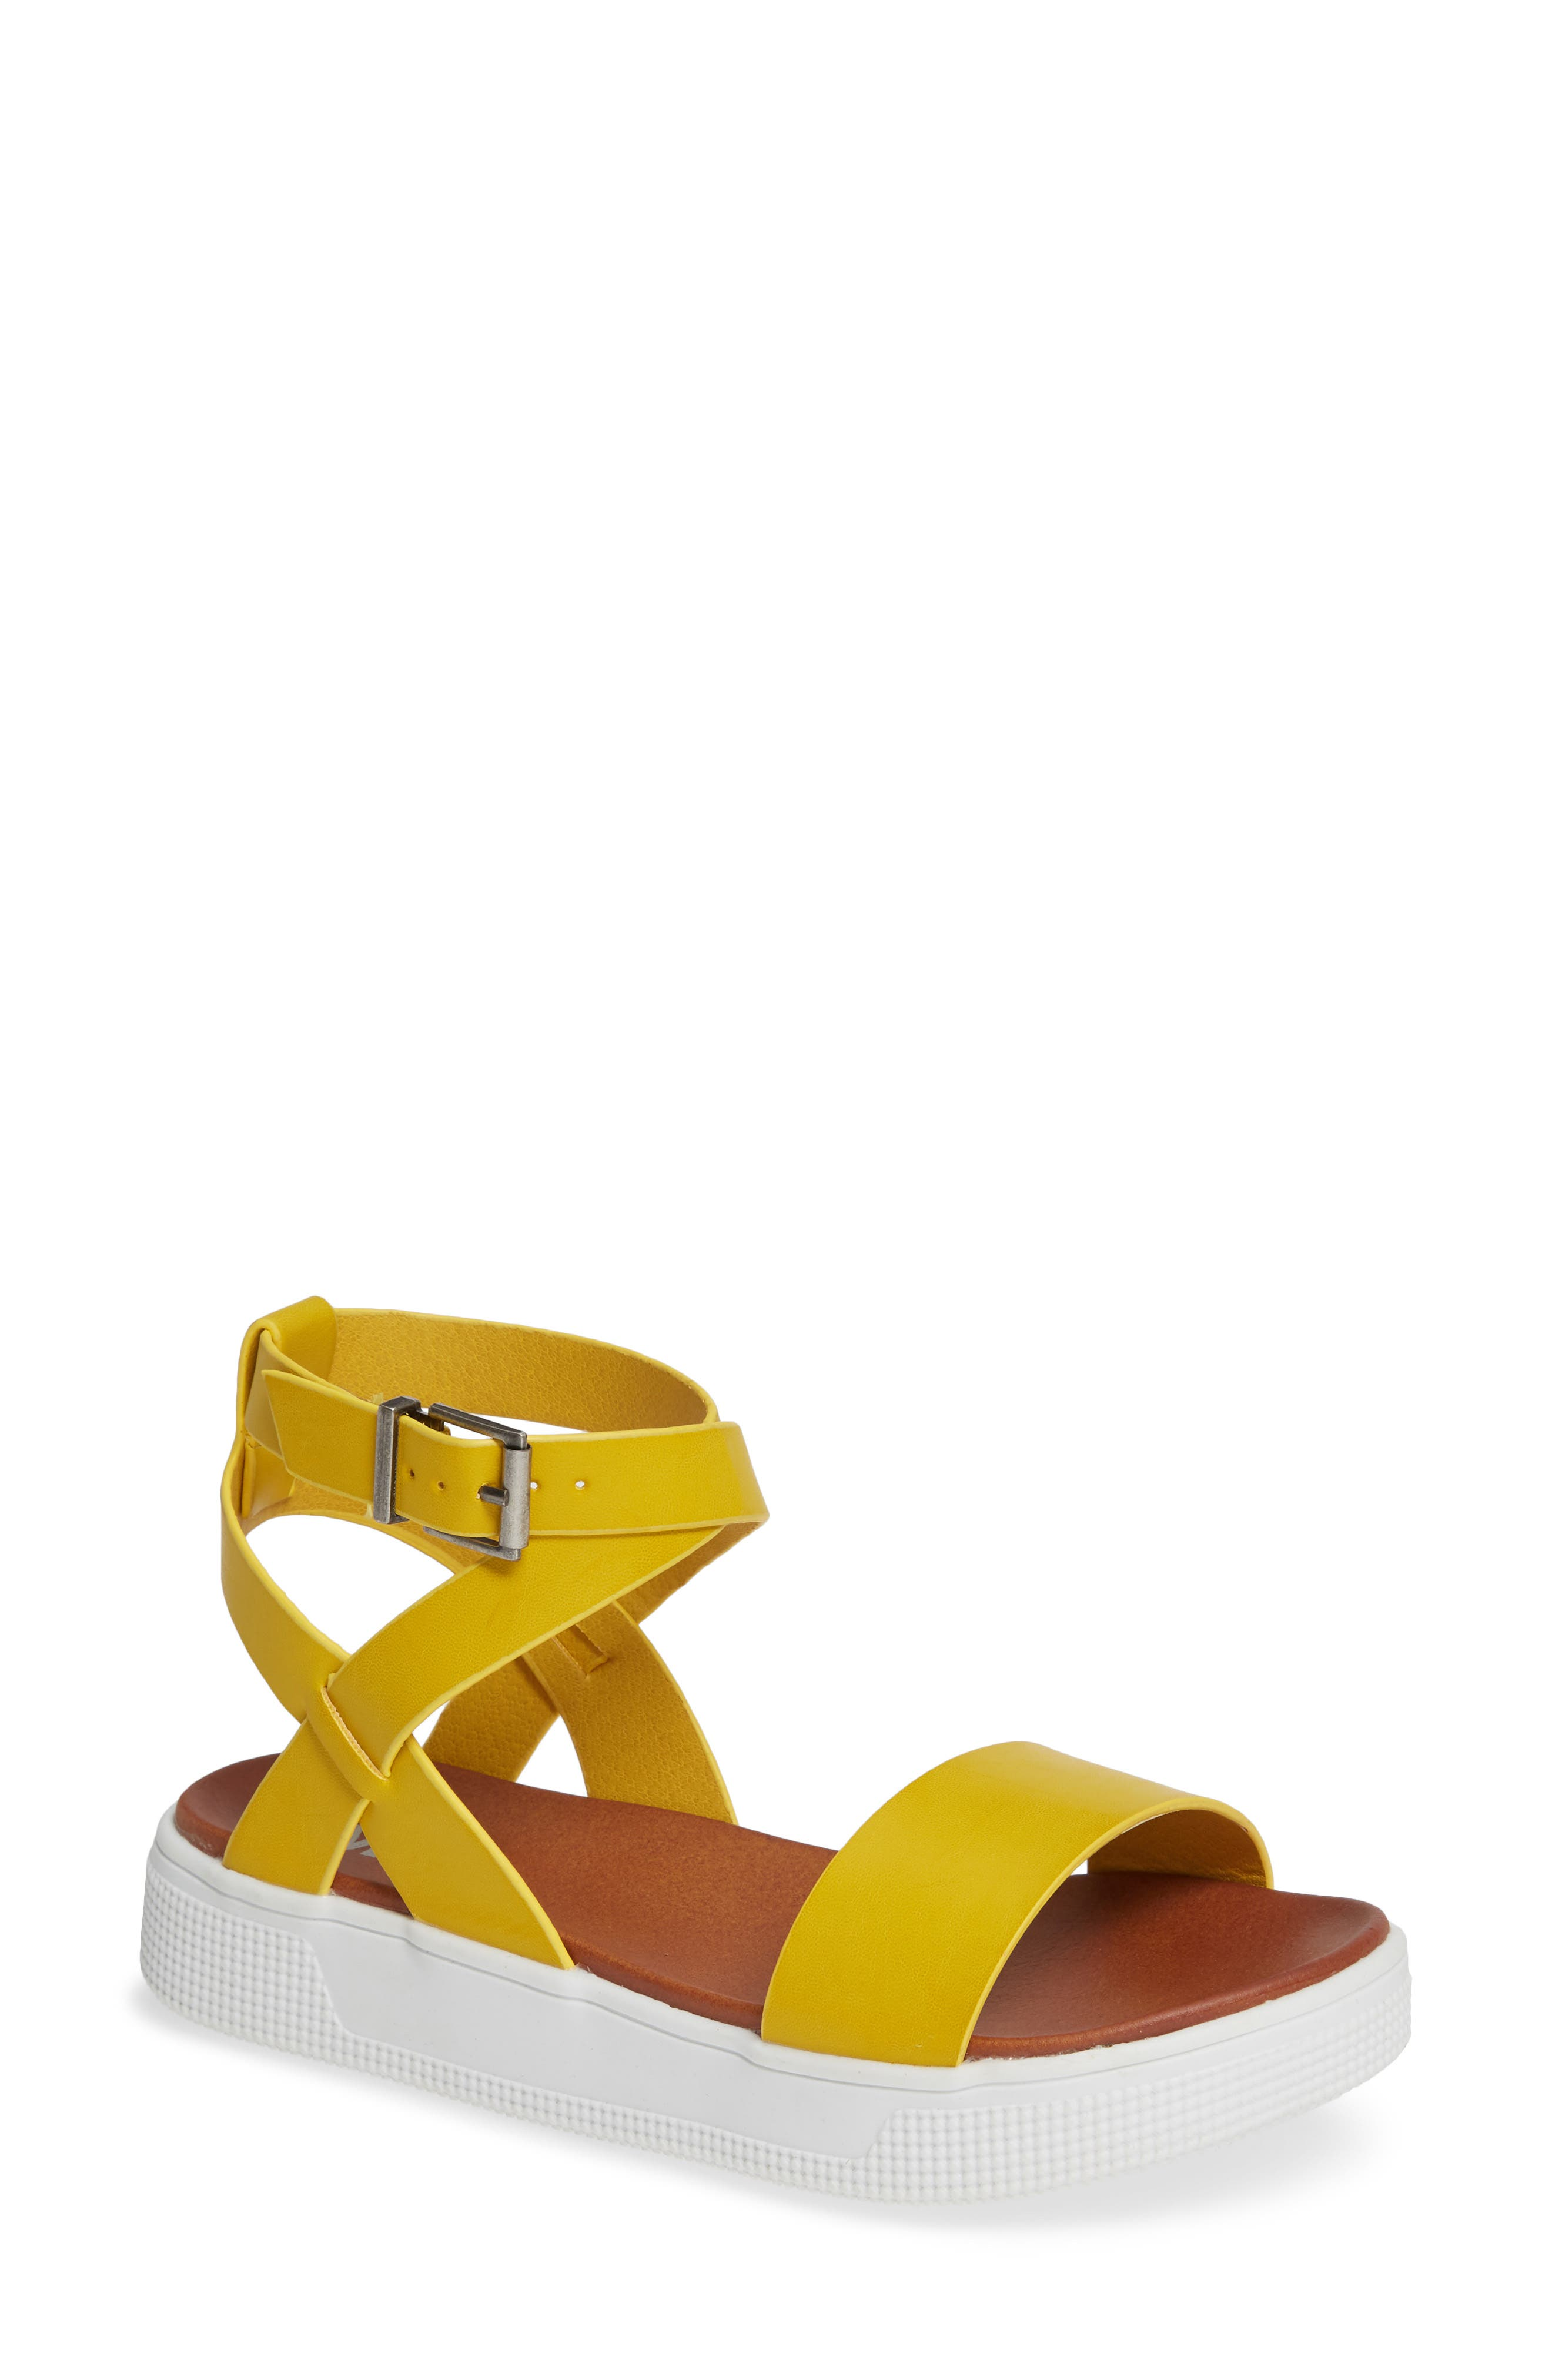 Calla Platform Sandal,                         Main,                         color, YELLOW FAUX LEATHER